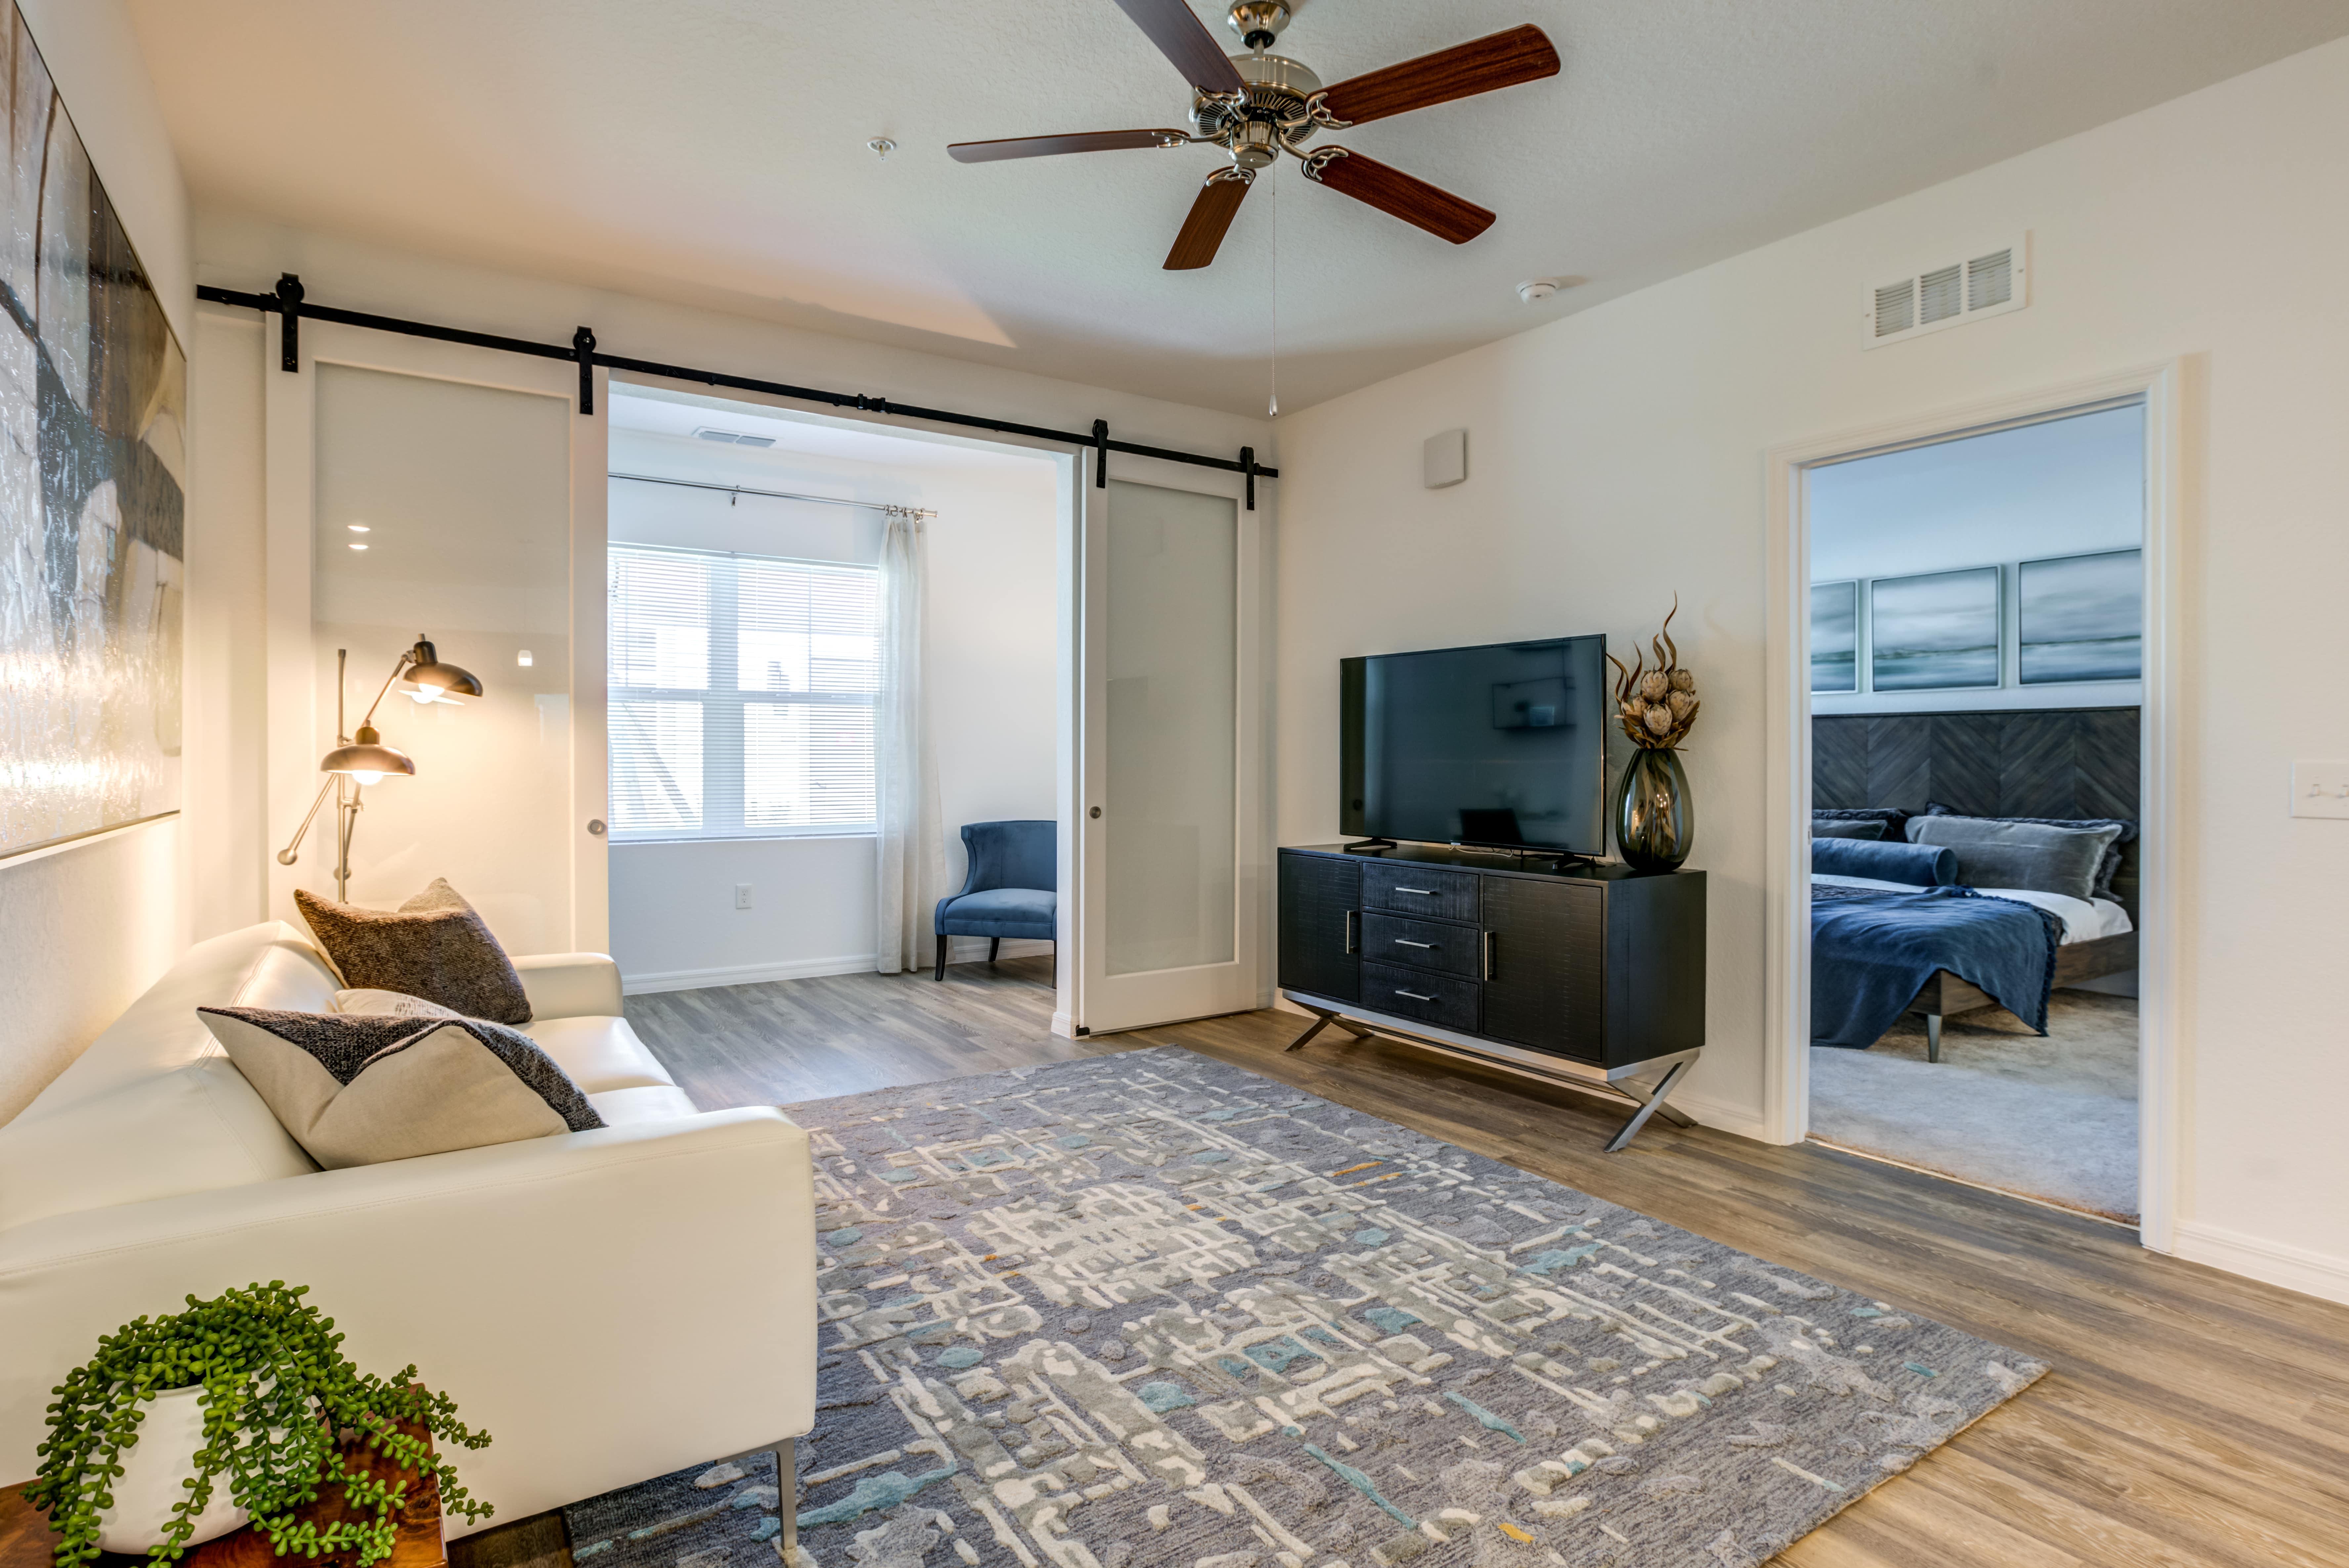 Living room with barn doors and hardwood floors